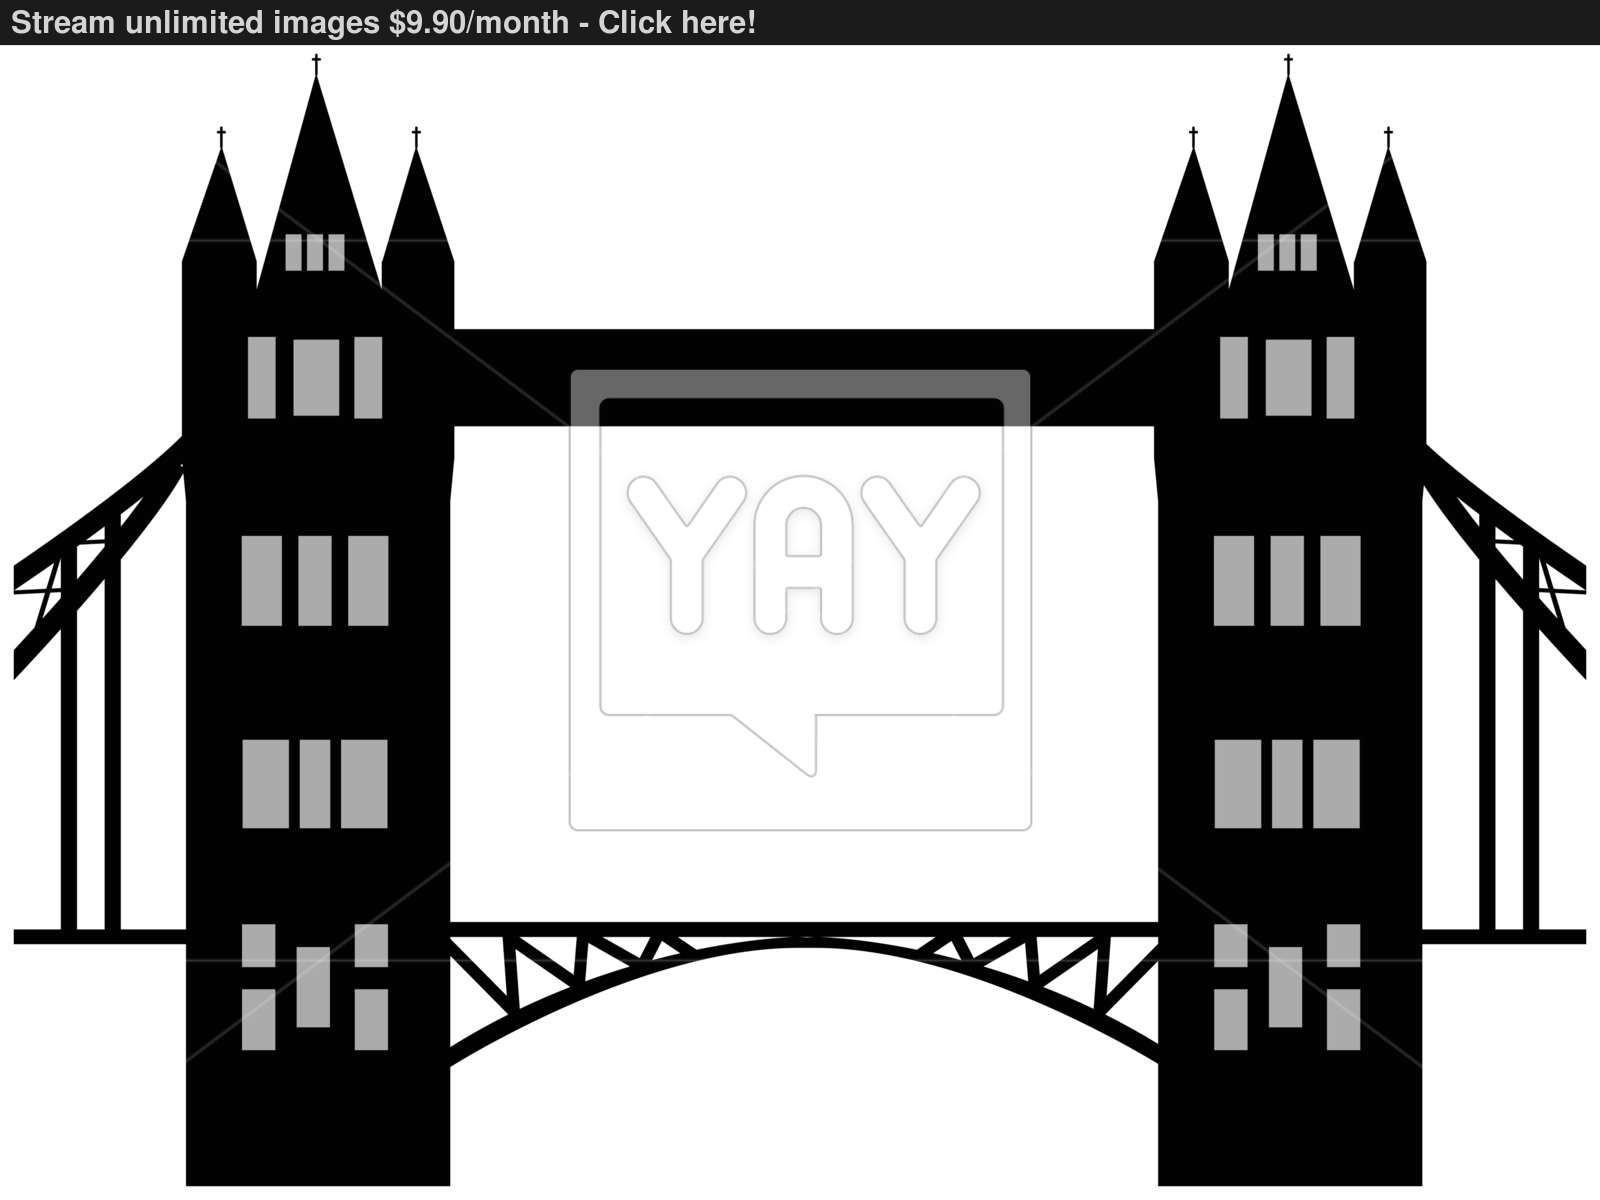 1600x1200 Image Of Cartoon Tower Bridge Silhouette. Vector Illustration